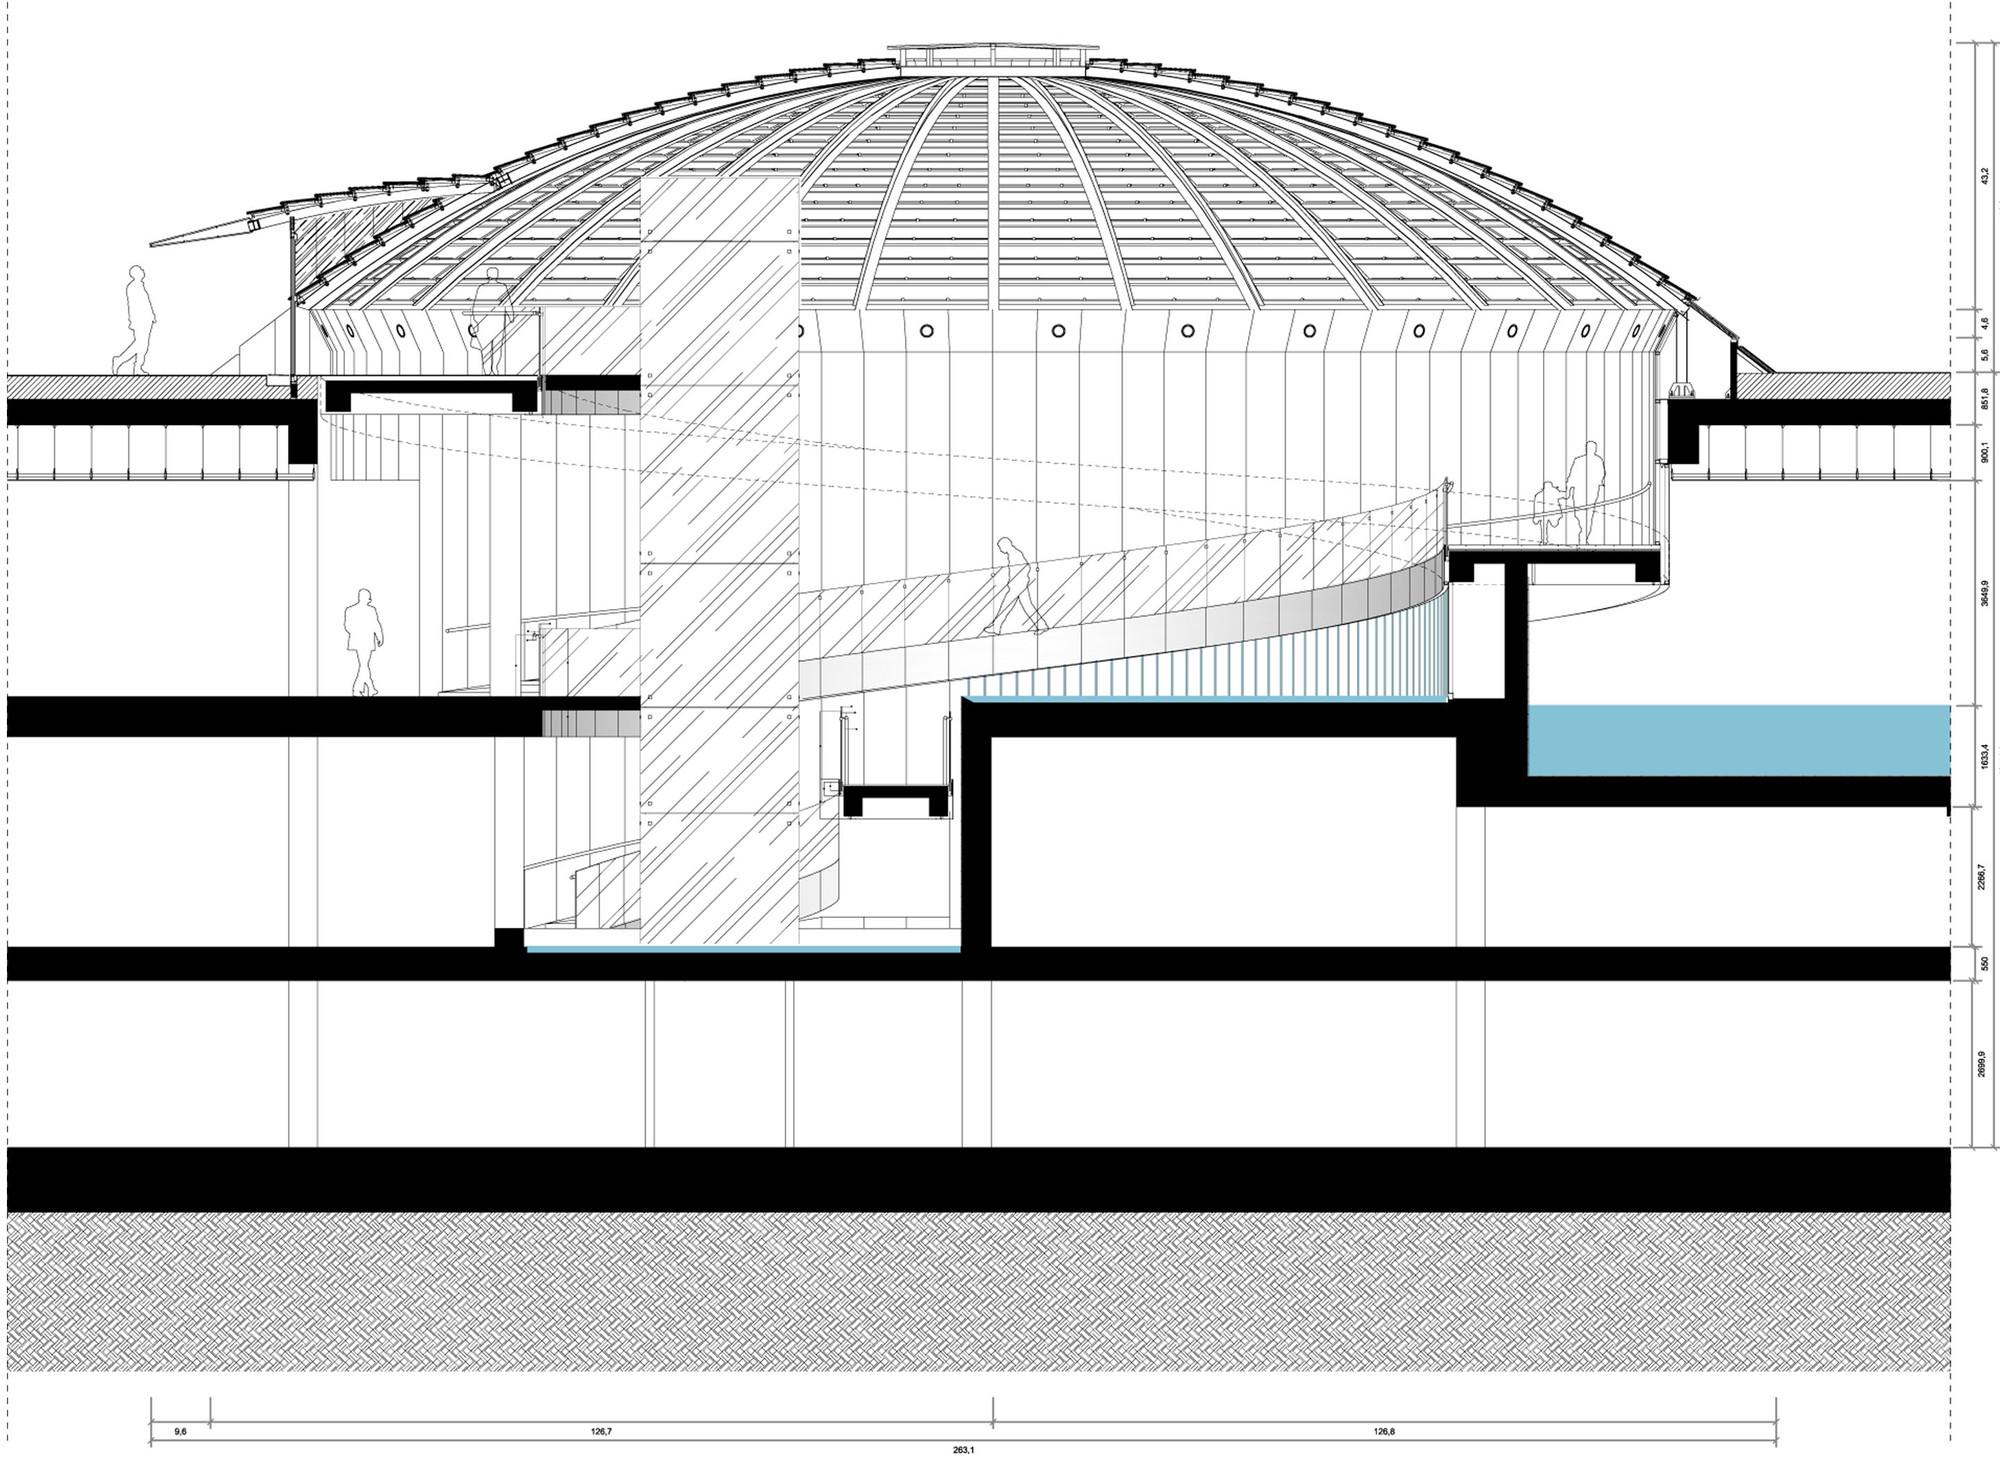 hight resolution of bagnoli futura section